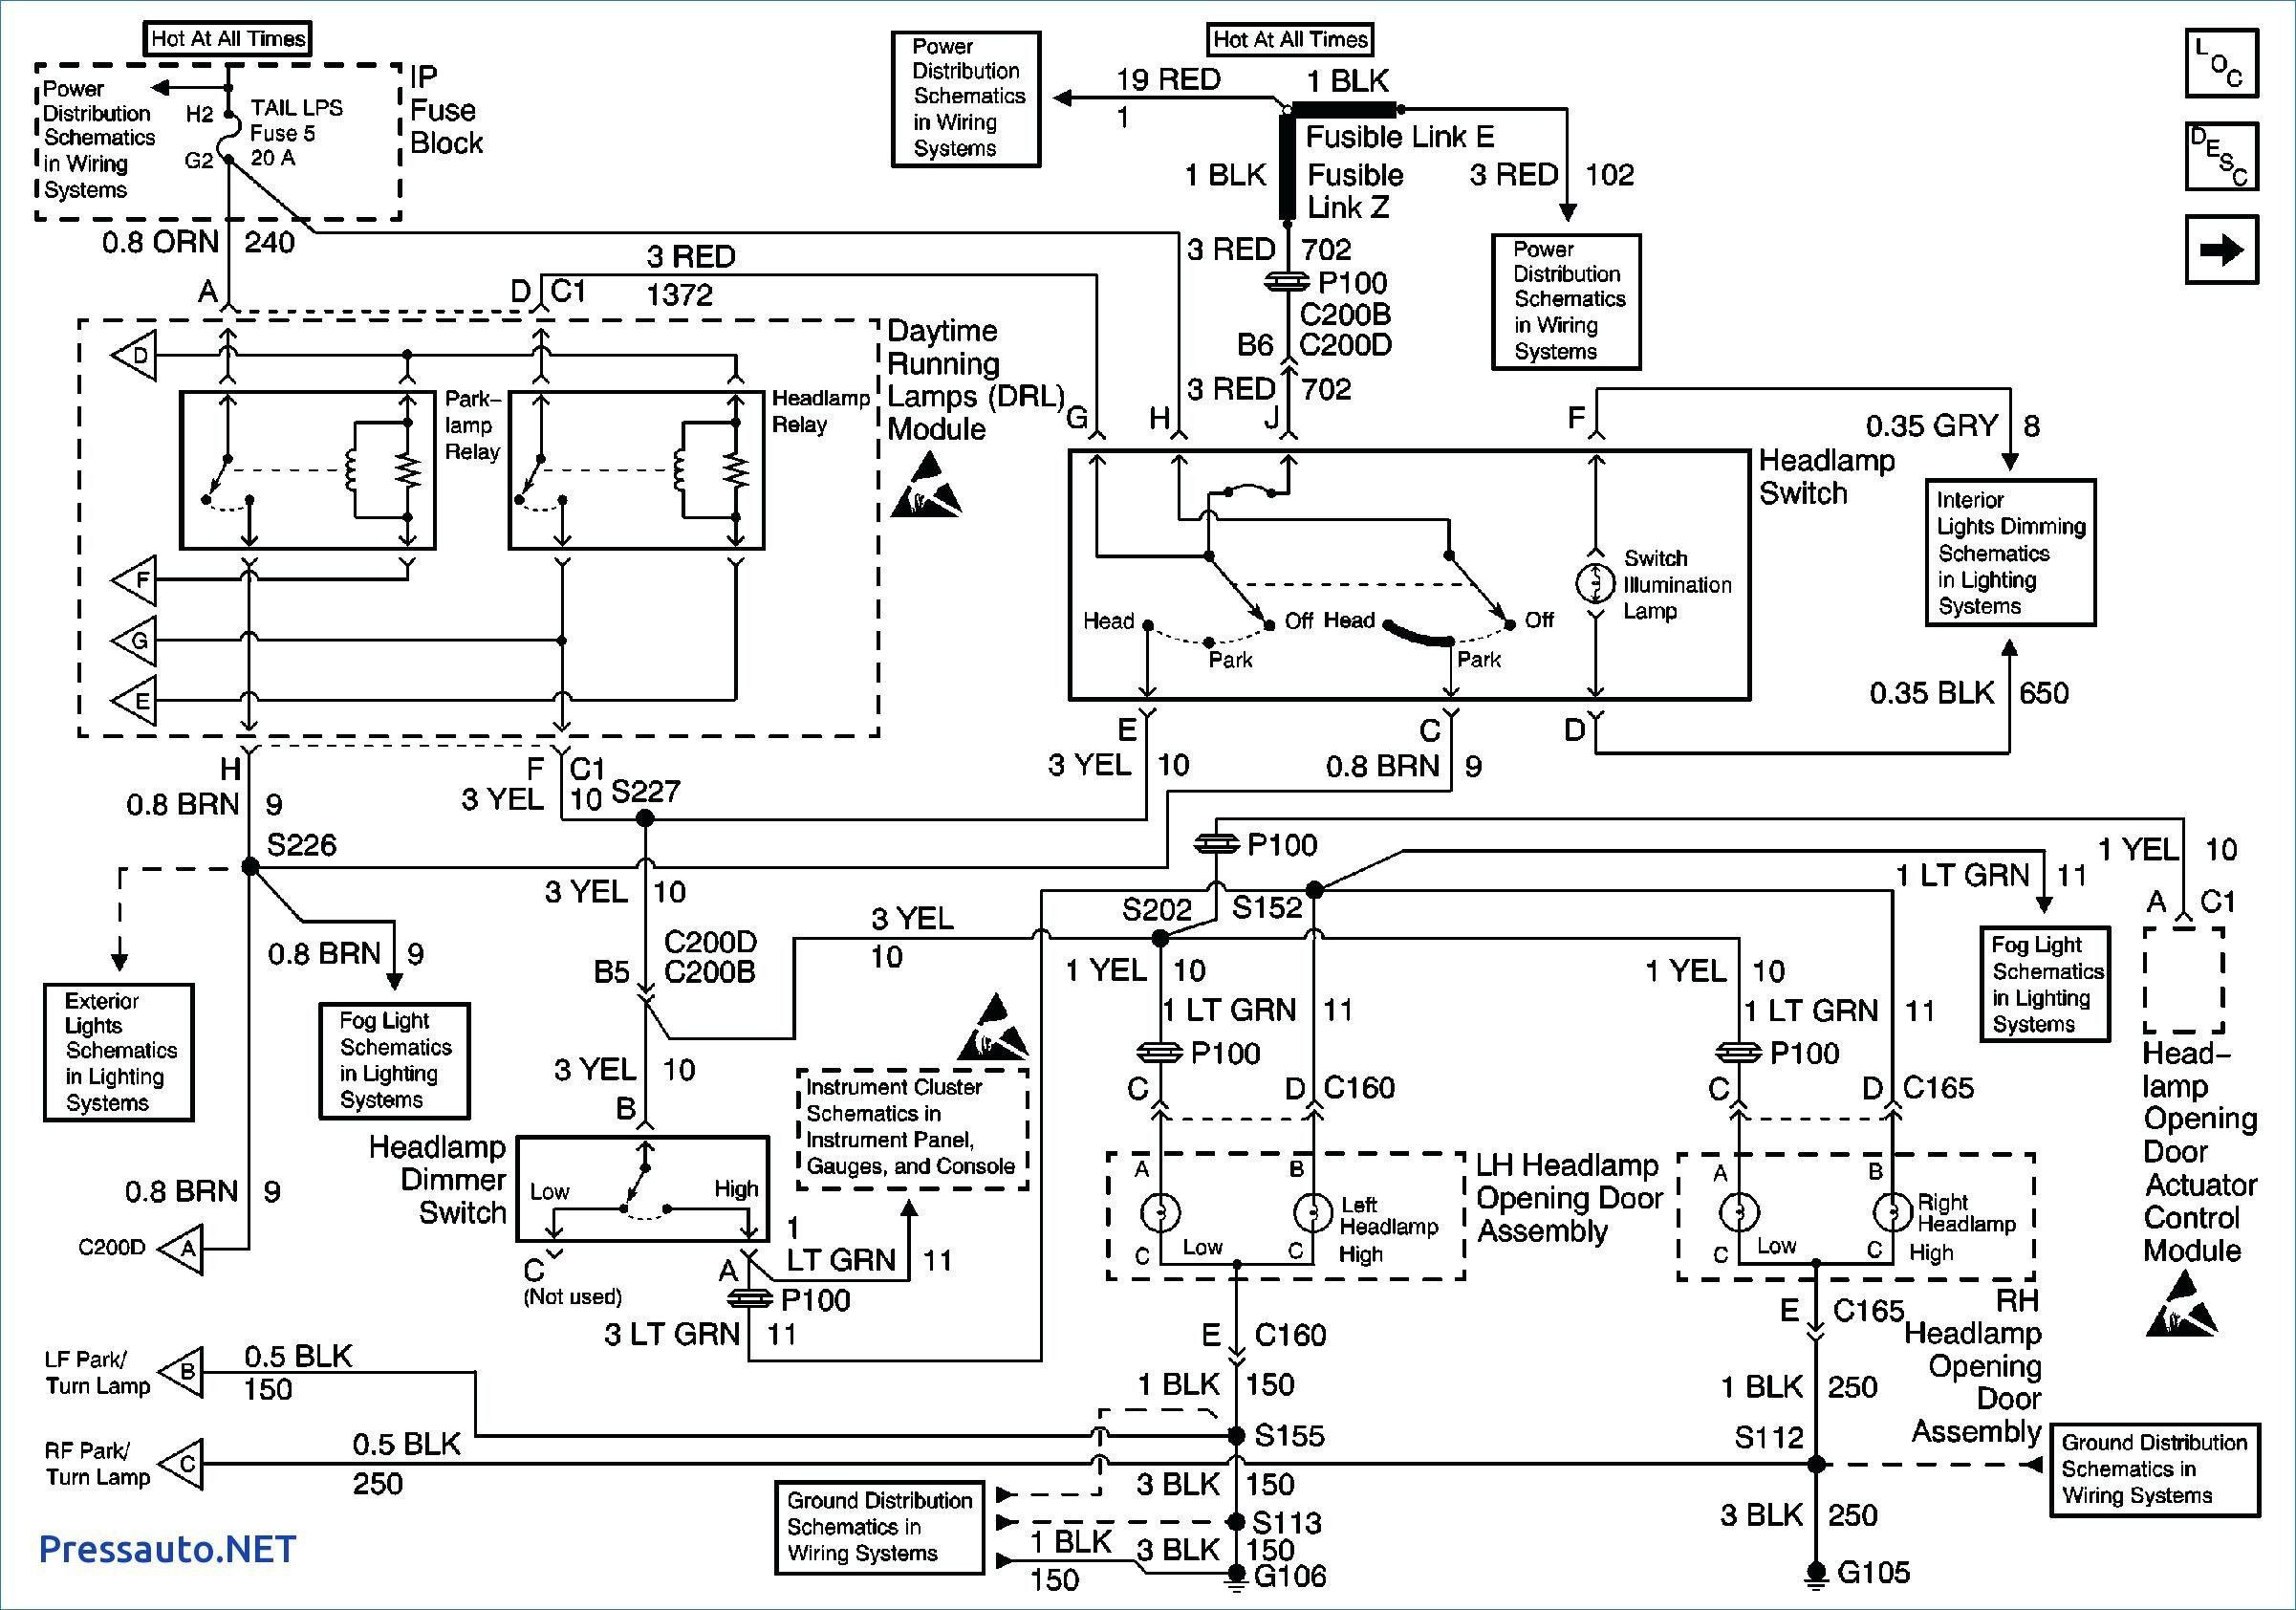 2002 Honda Civic Wiring Schematics In 2020 Electrical Wiring Diagram Diagram Repair Guide